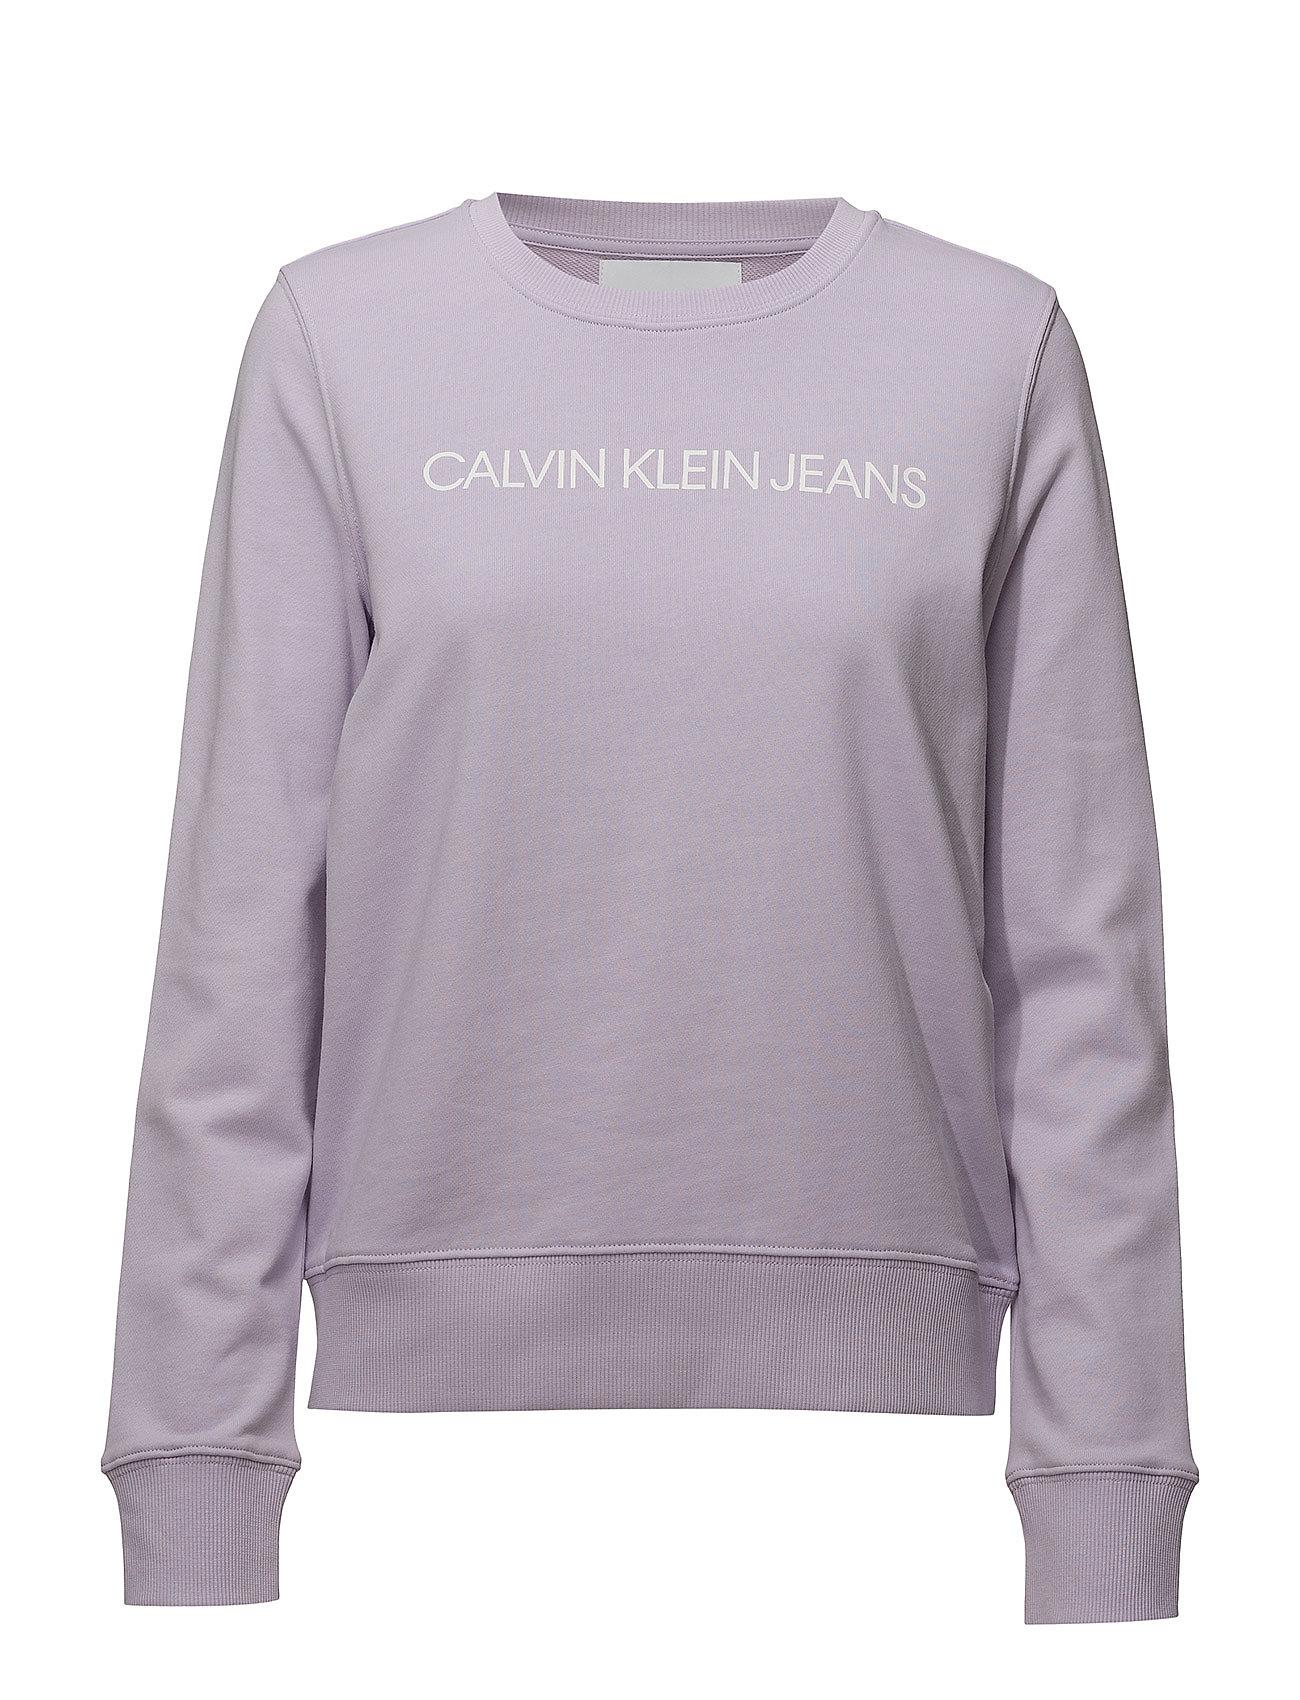 Calvin Klein Jeans INSTITUTIONAL LOGO S - ORCHID PETAL